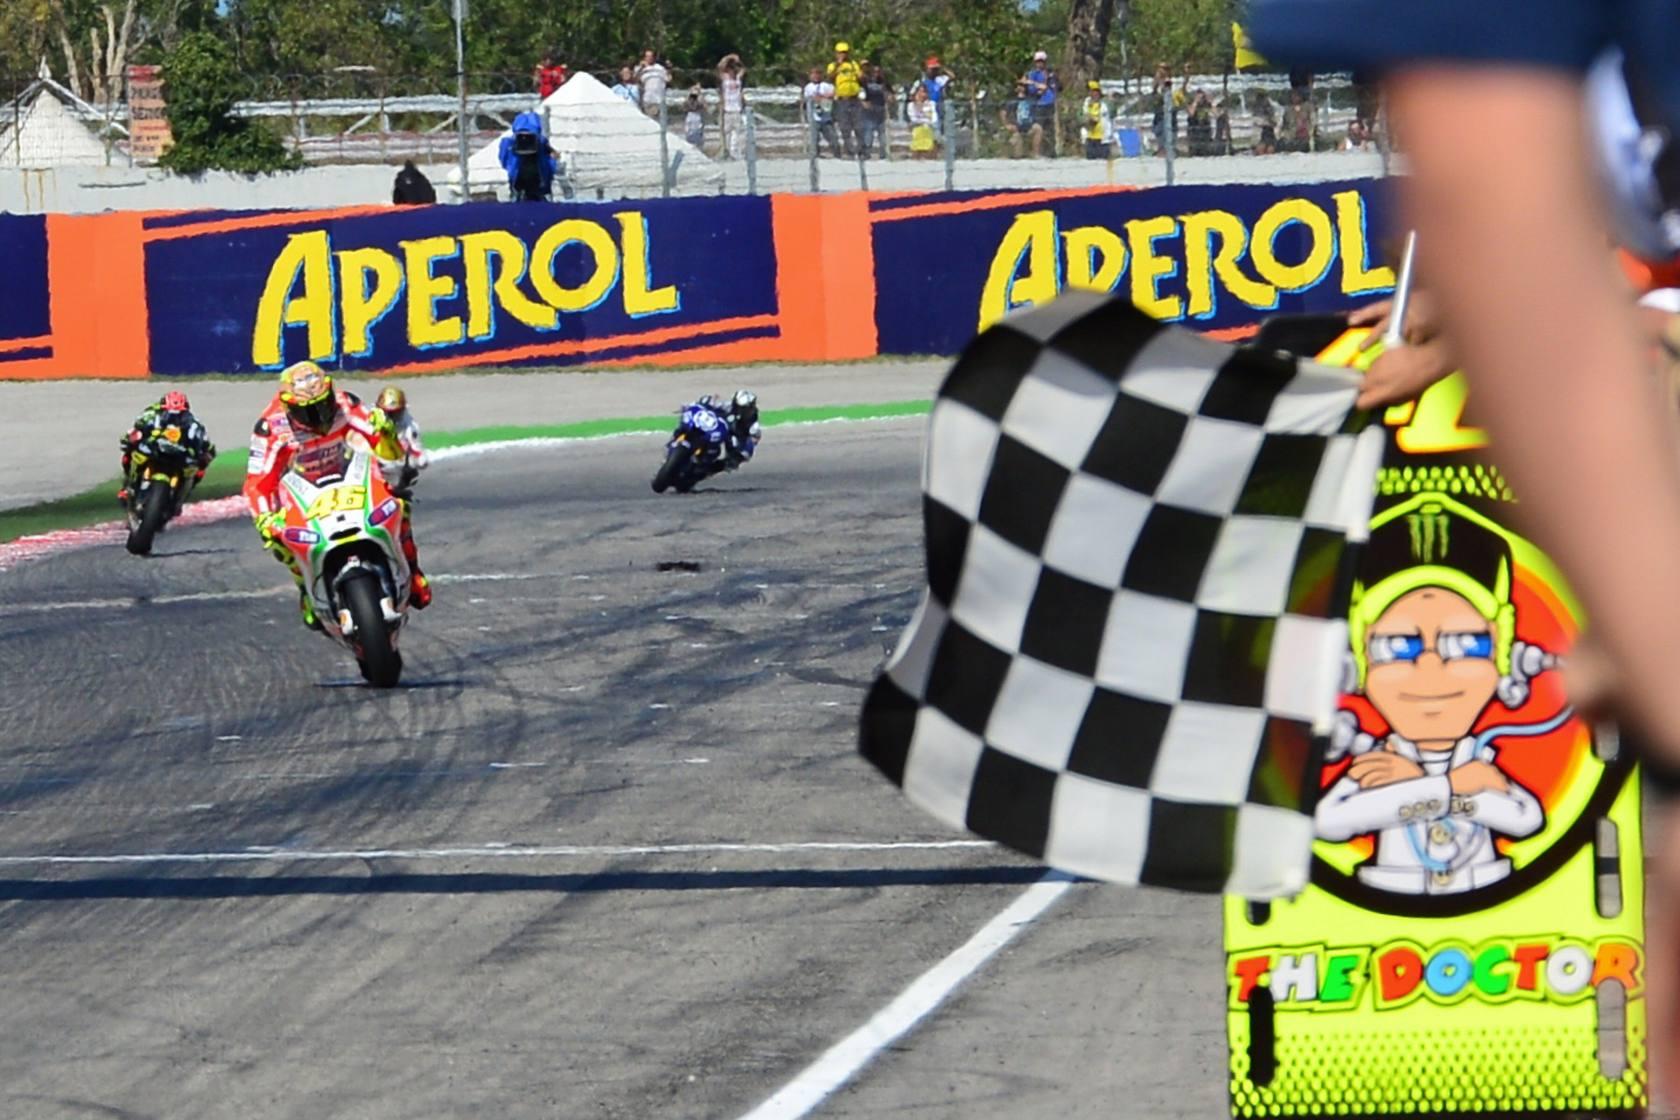 Lorenzo aprovecha la caída de Pedrosa y gana Gran Premio de San Marino